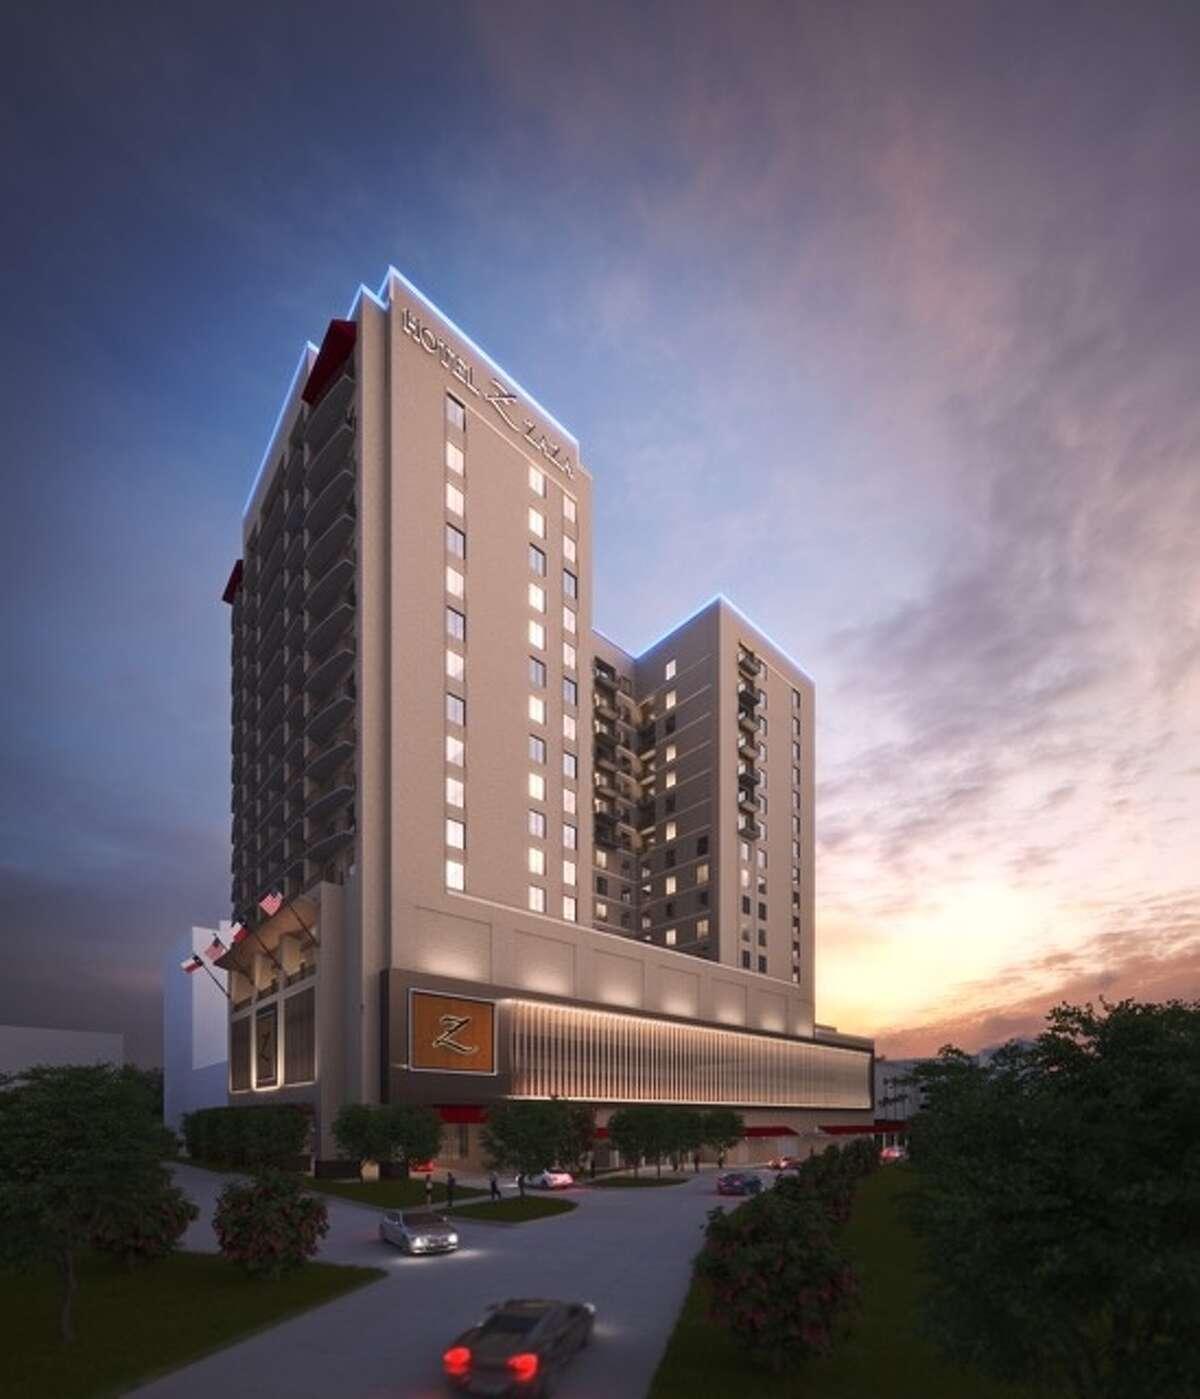 Rendering of Hotel Zaza planned to open in summer 2017 in Memorial City.